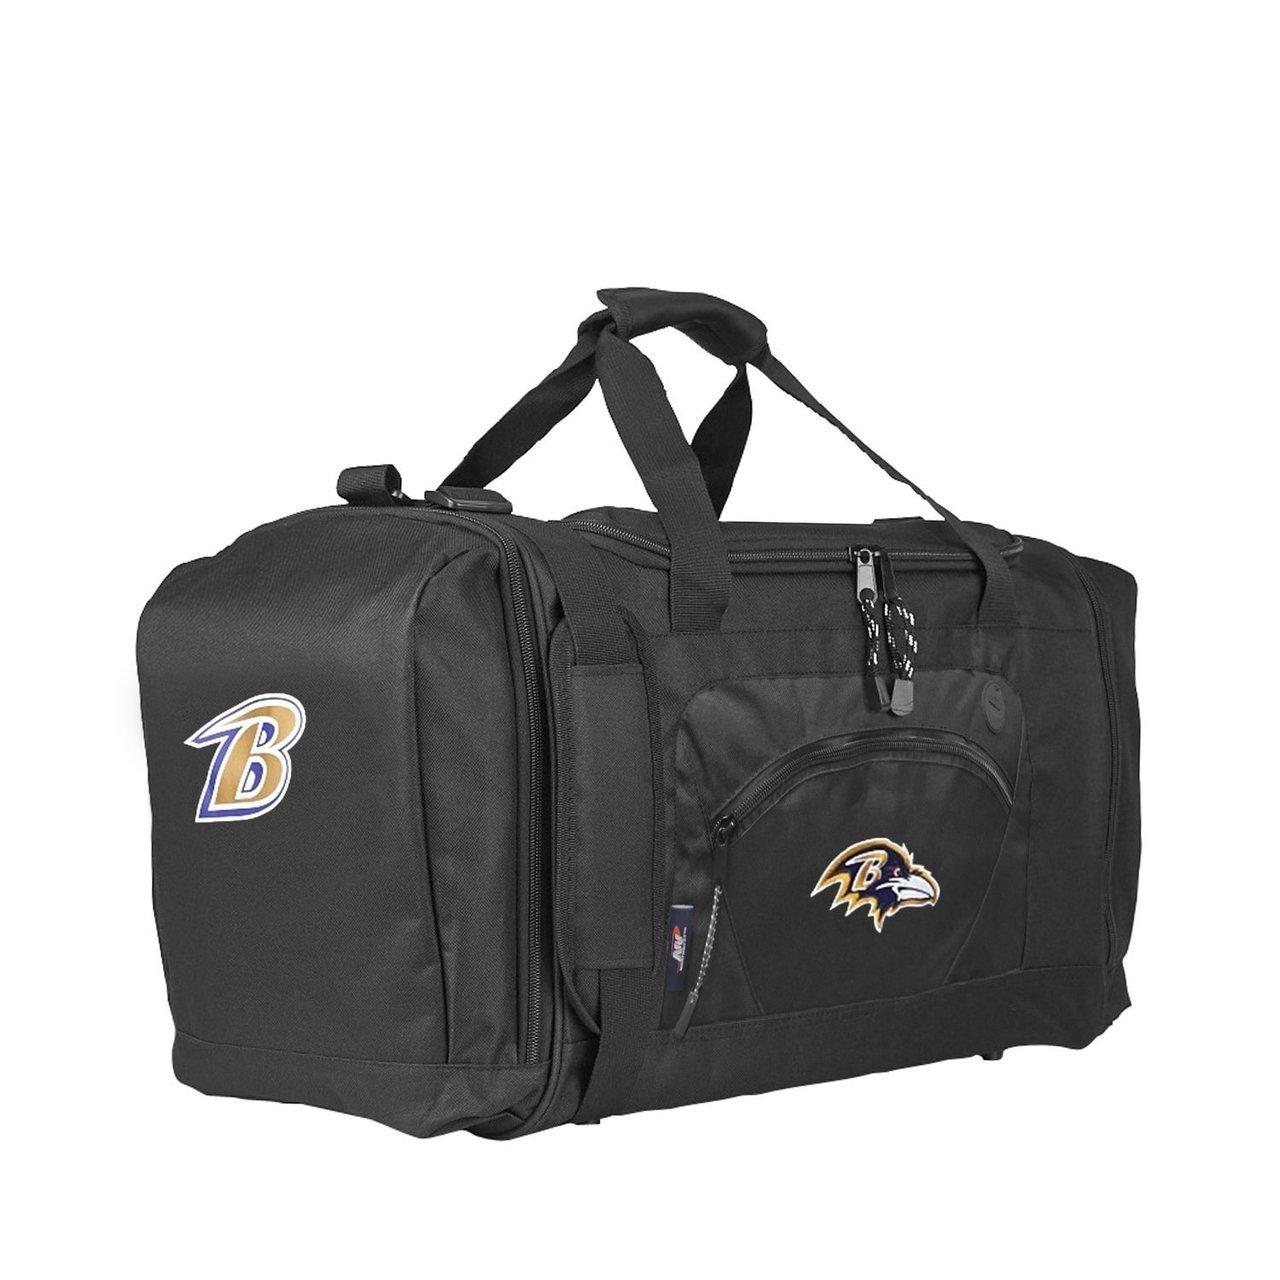 The Northwest Company Officially Licensed NFL Baltimore Ravens Unisex Roadblock Duffel Bag, Black